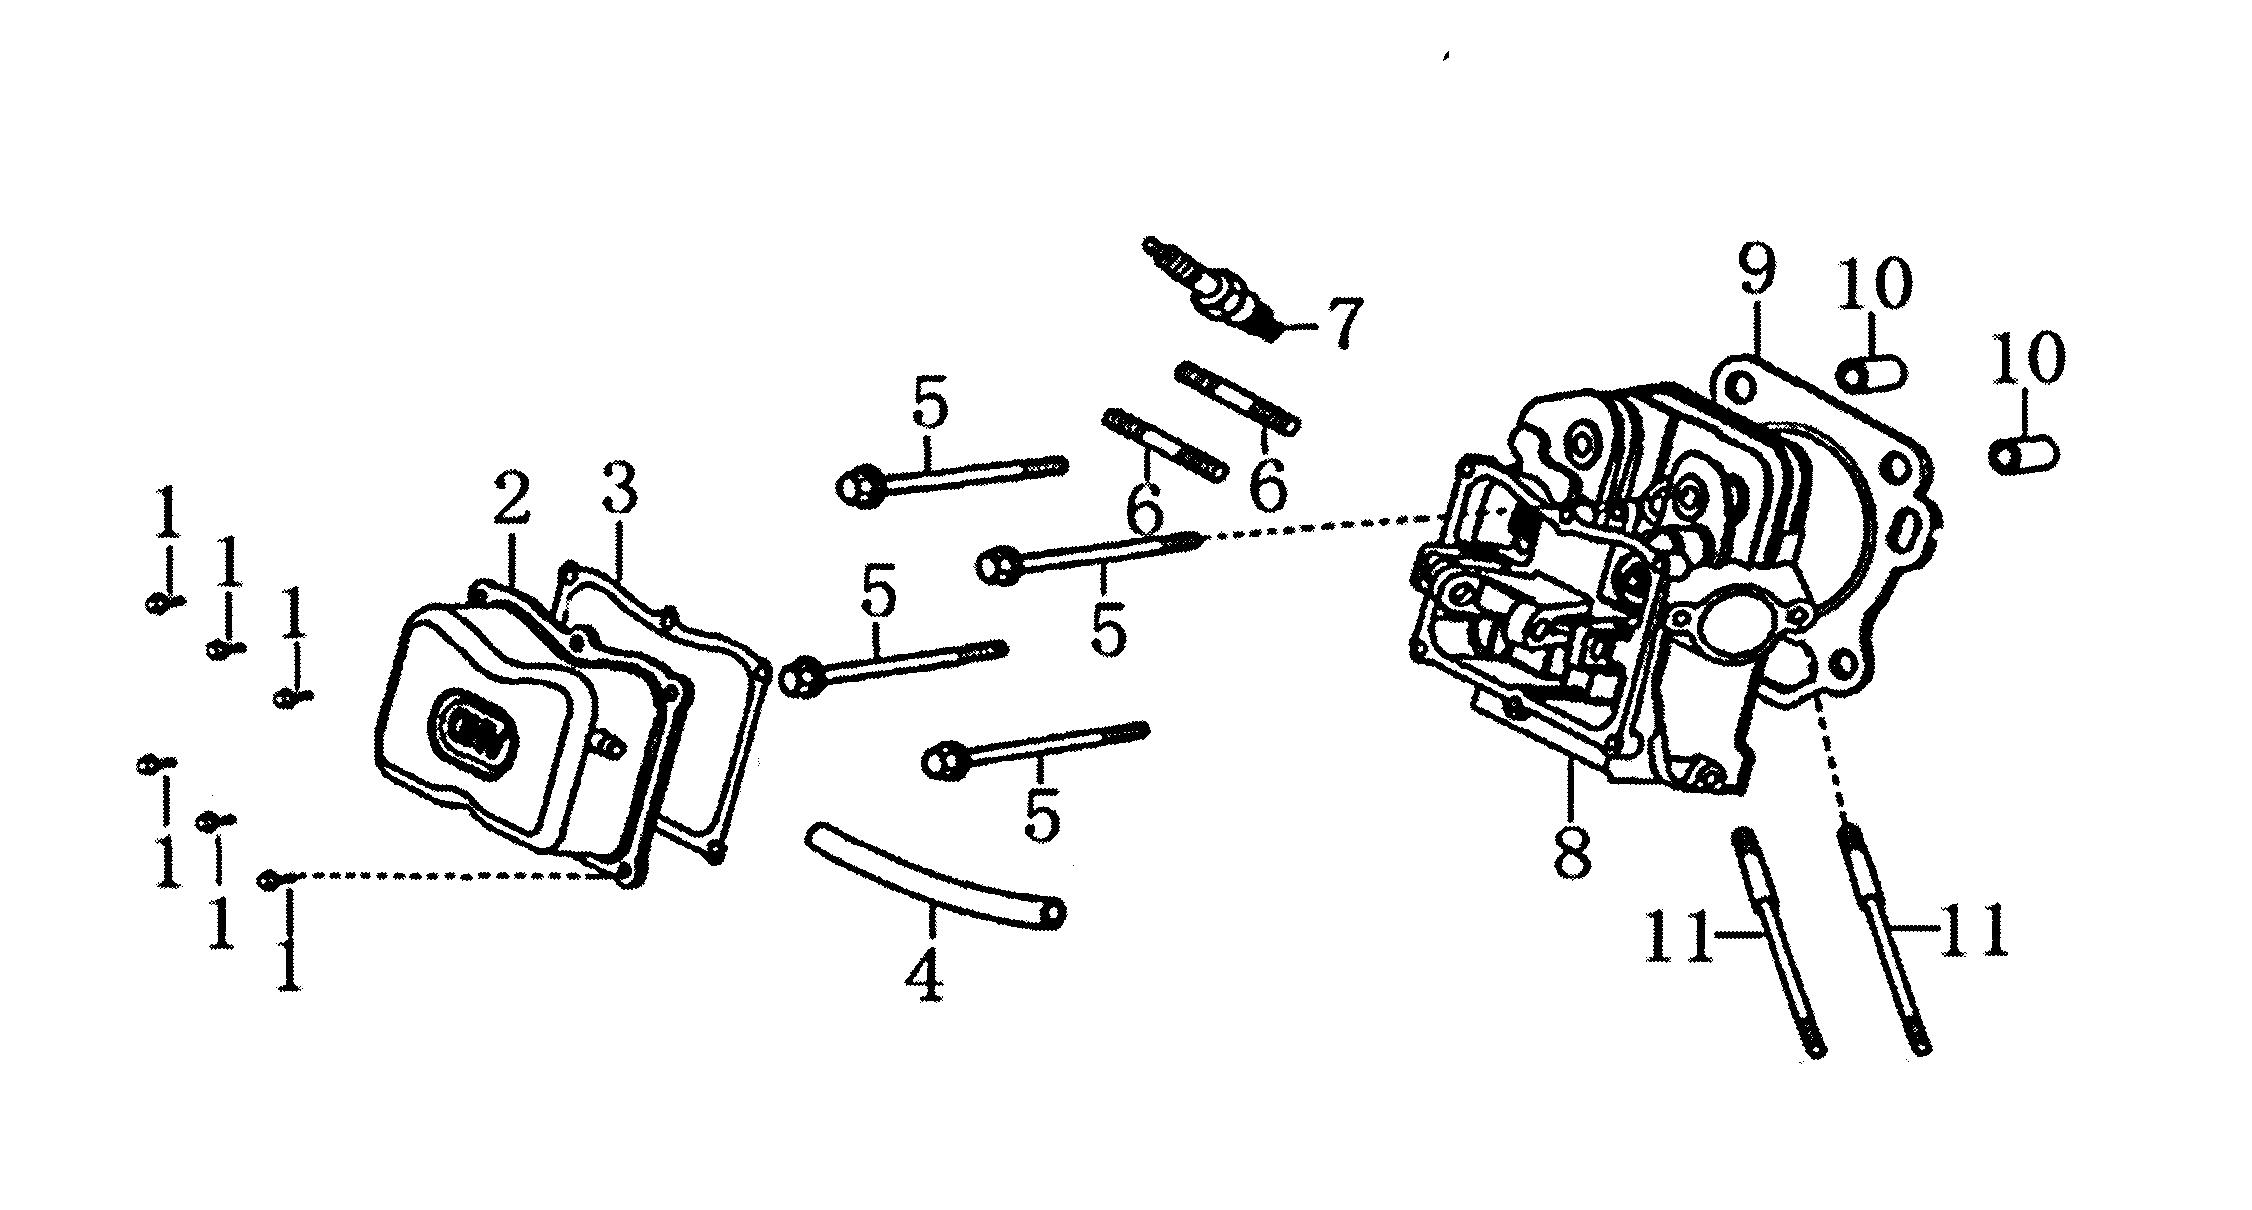 Generac model 006673-0 generator genuine parts